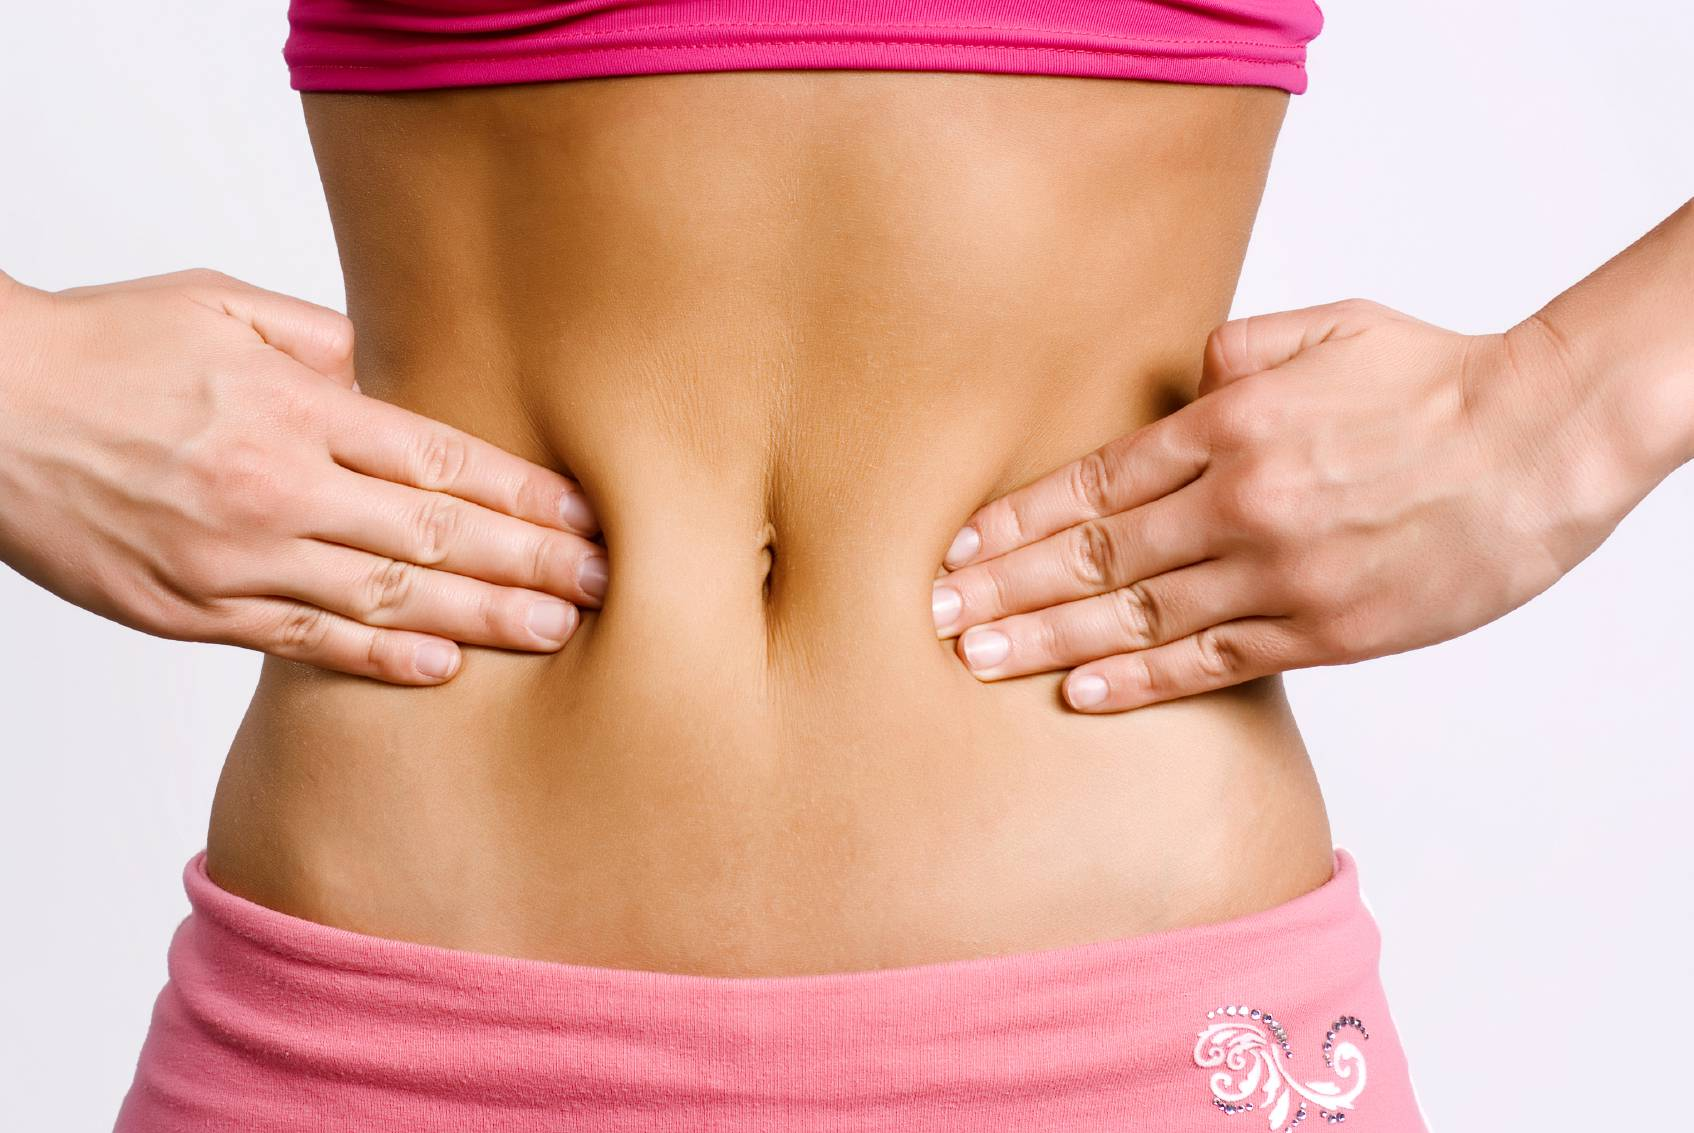 Diete Veloci 10 Kg In 2 Settimane : Consigli per perdere kg in due settimane